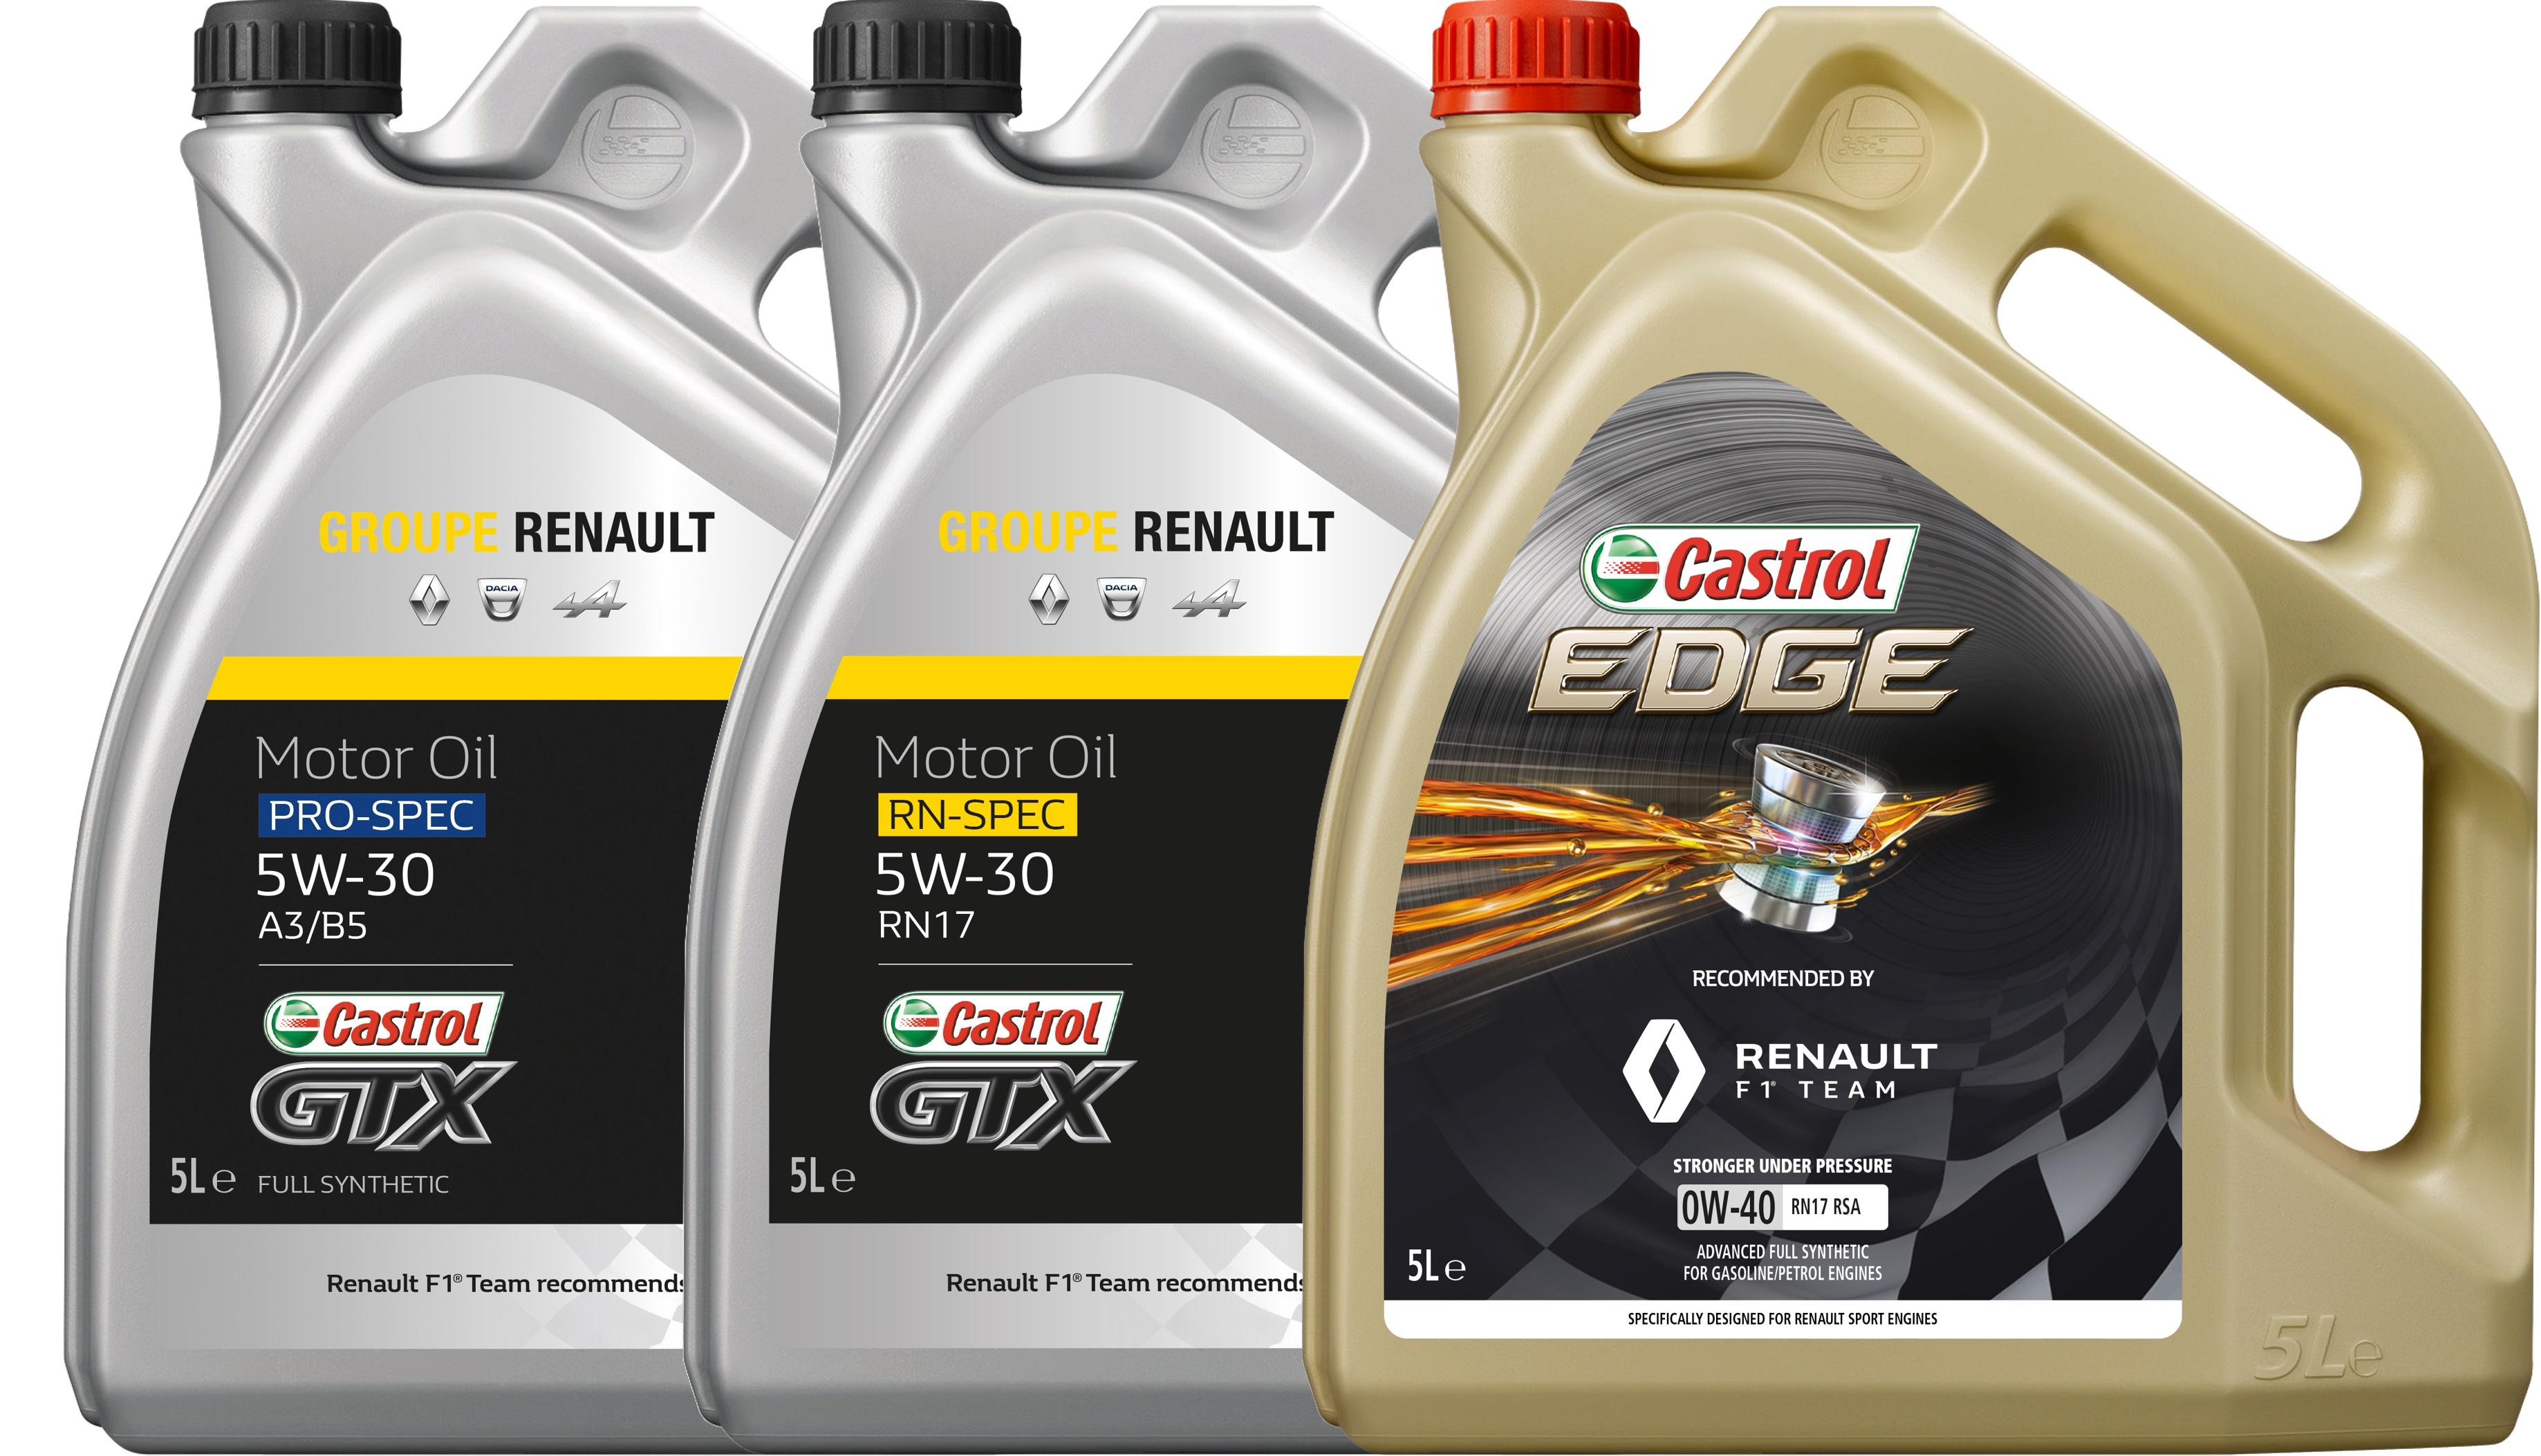 Castrol and Renault range jpg